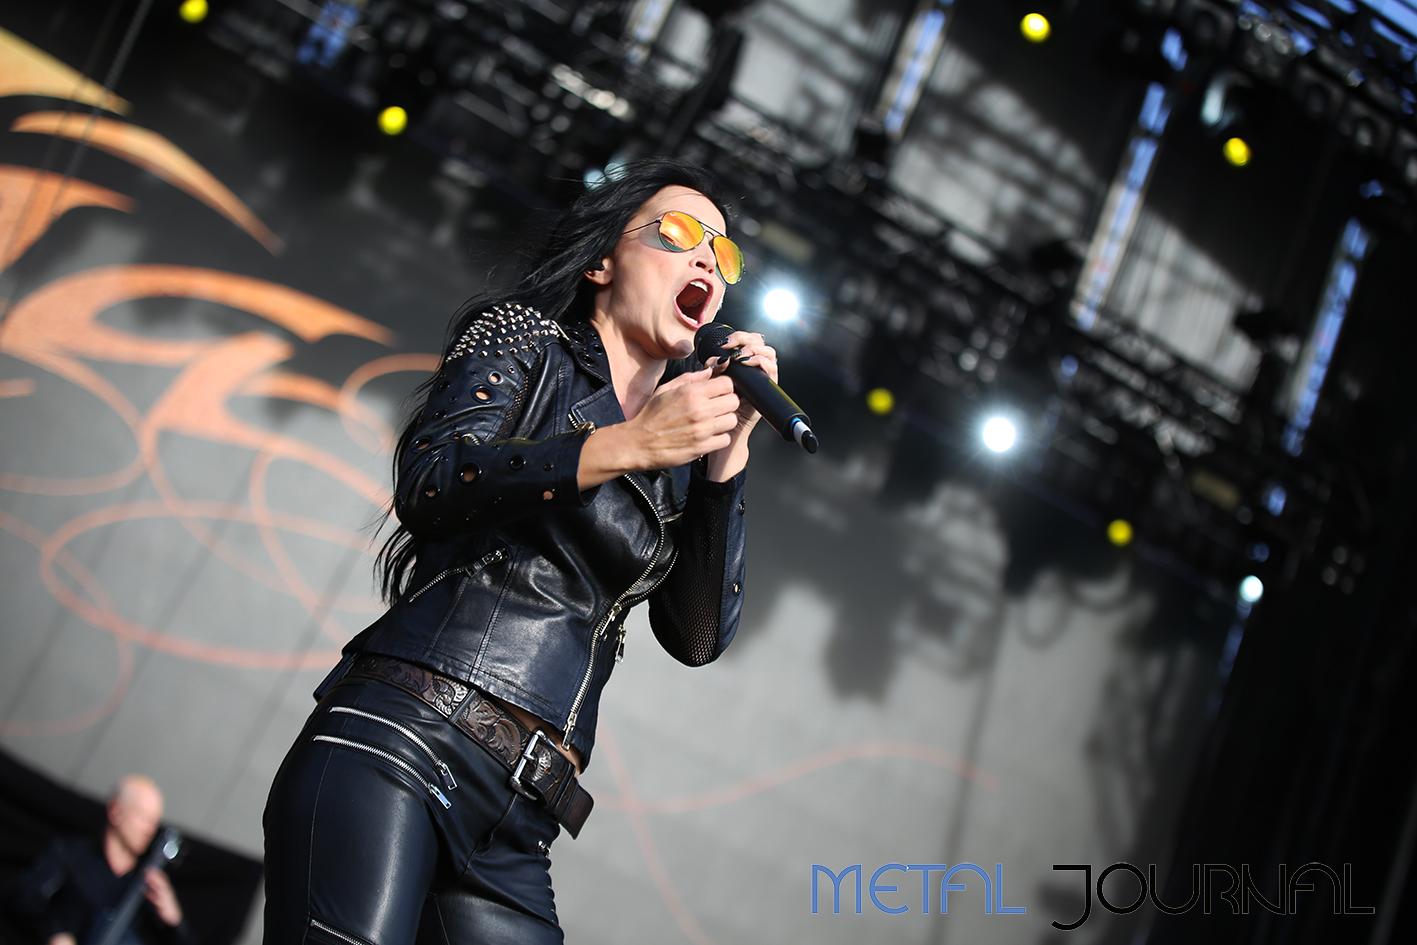 tarja metal journal rock the coast 2019 pic 2